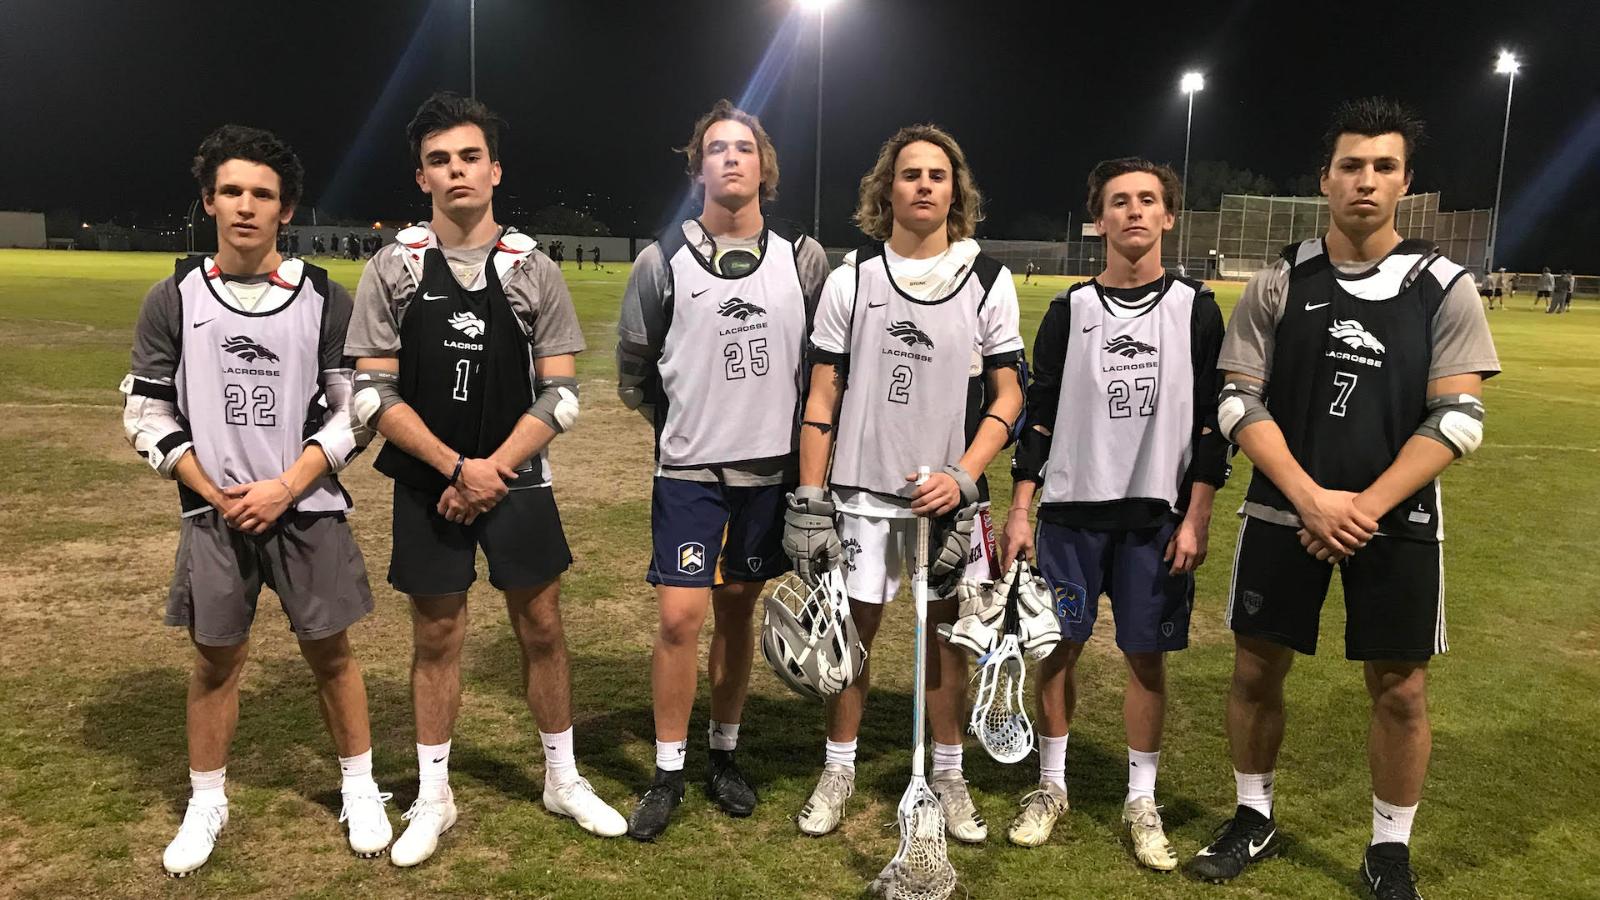 Boys Lacrosse Senior Night!